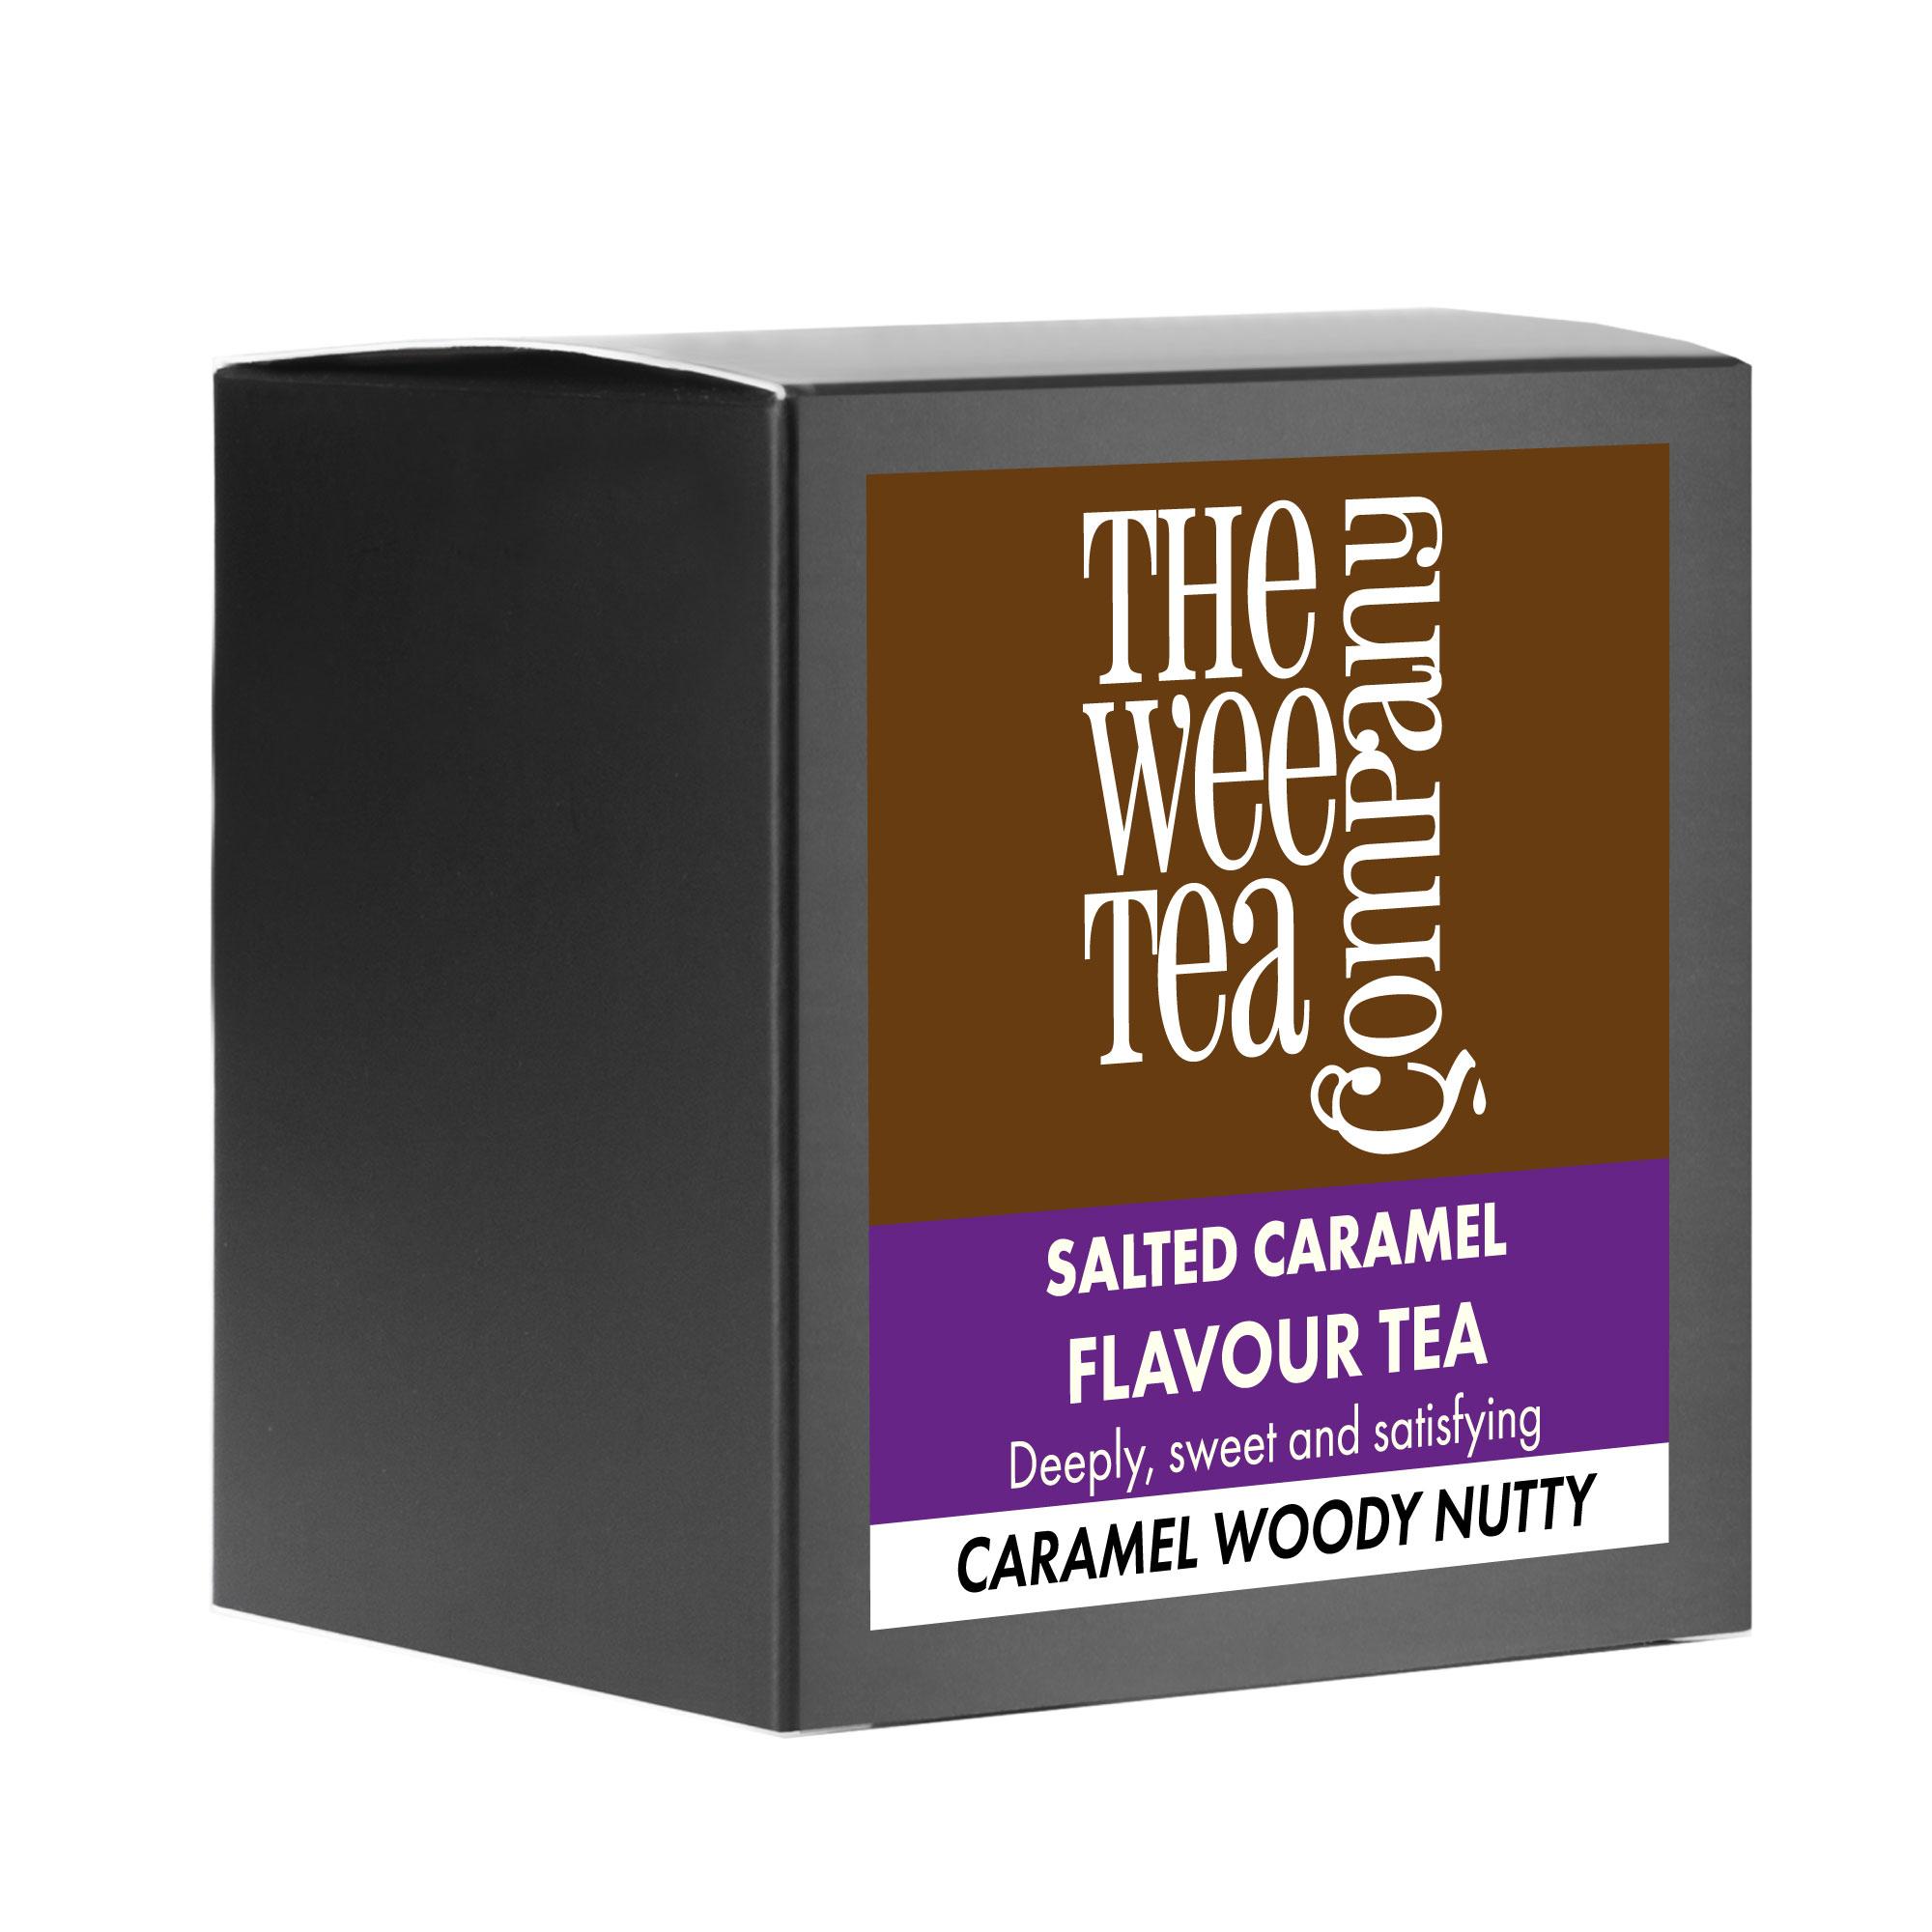 Salted Caramel Oolong Tea